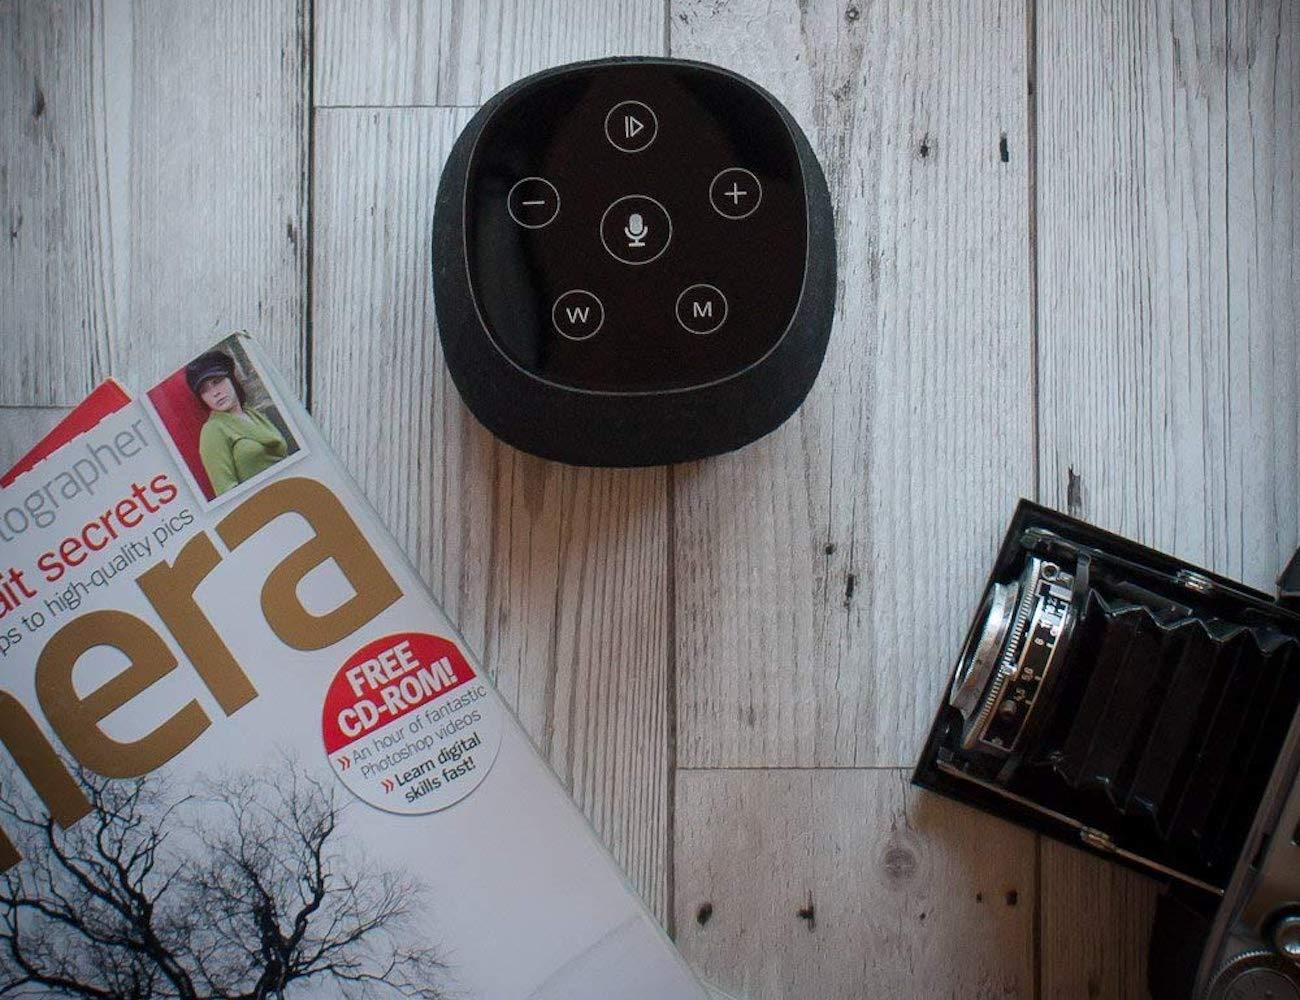 August Venus Smart Wi-Fi Speaker